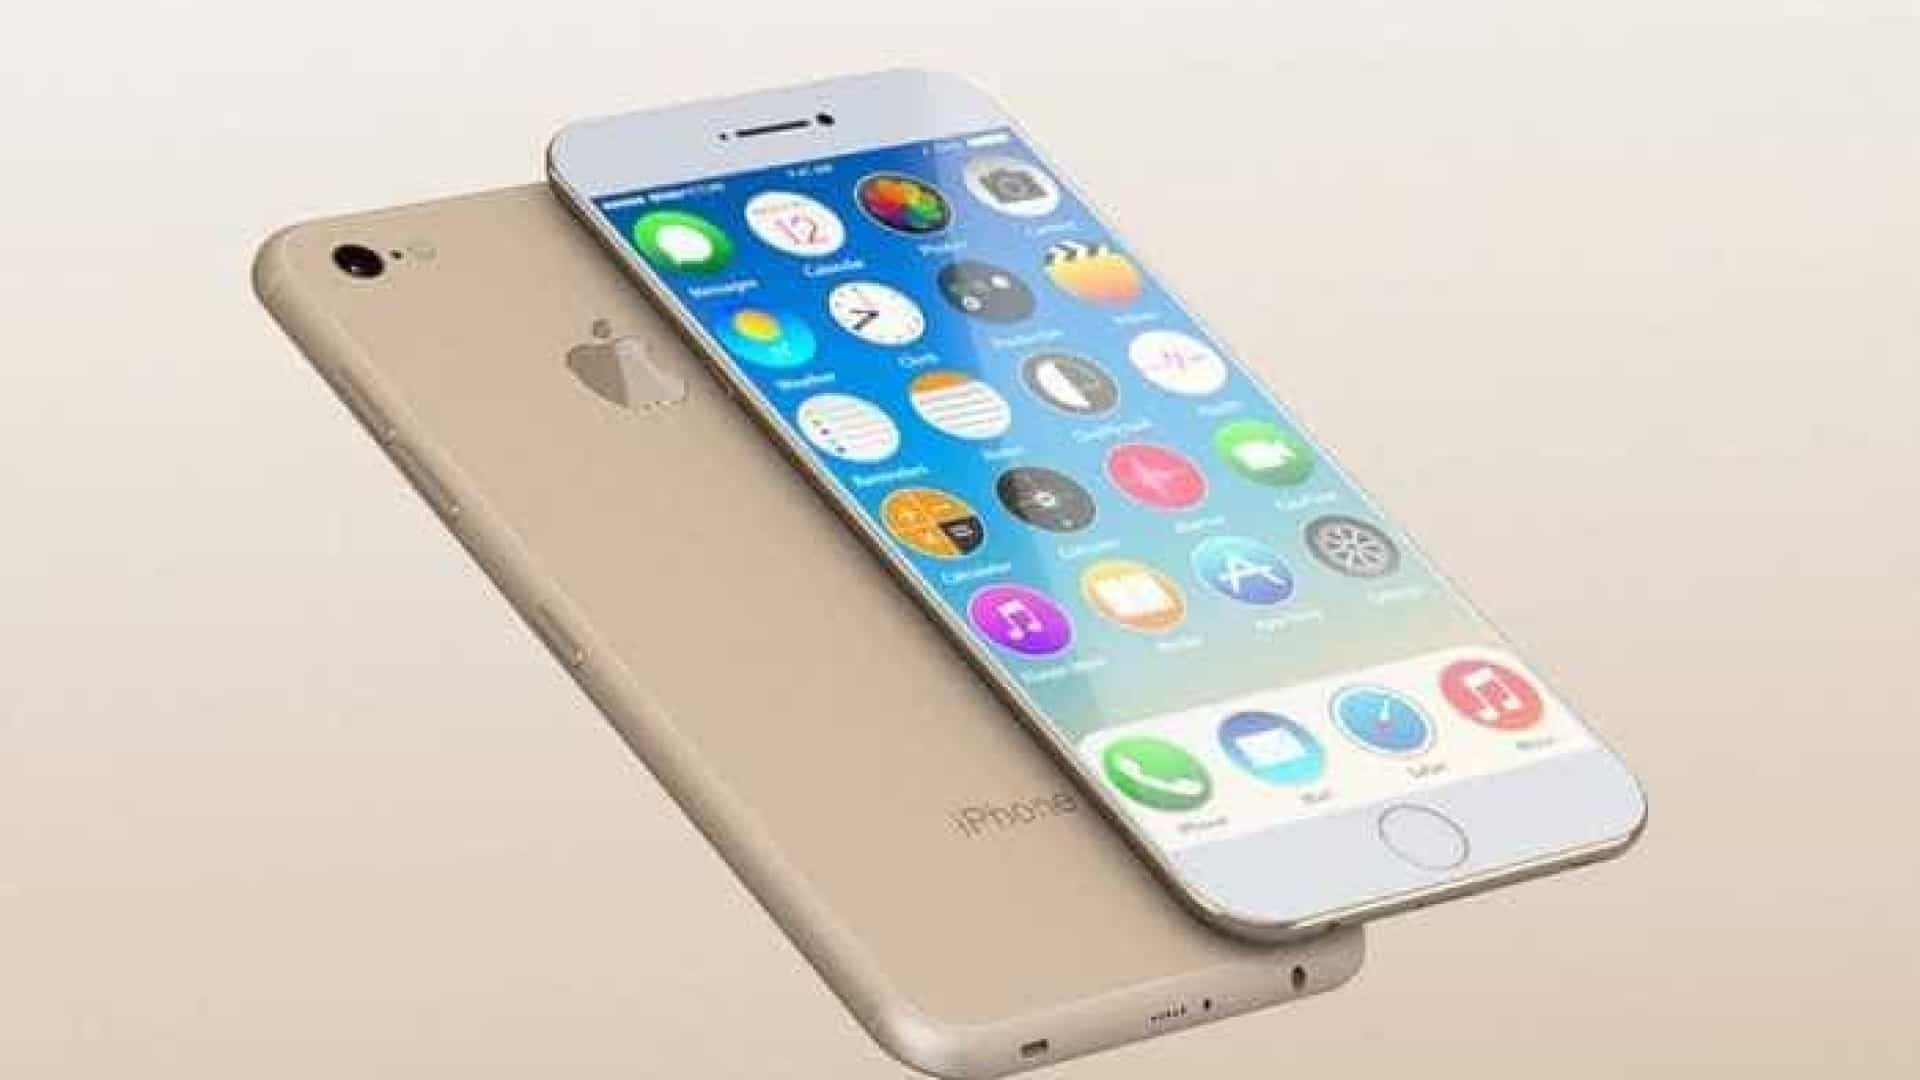 Veja os prováveis preços do iPhone 7 no Brasil